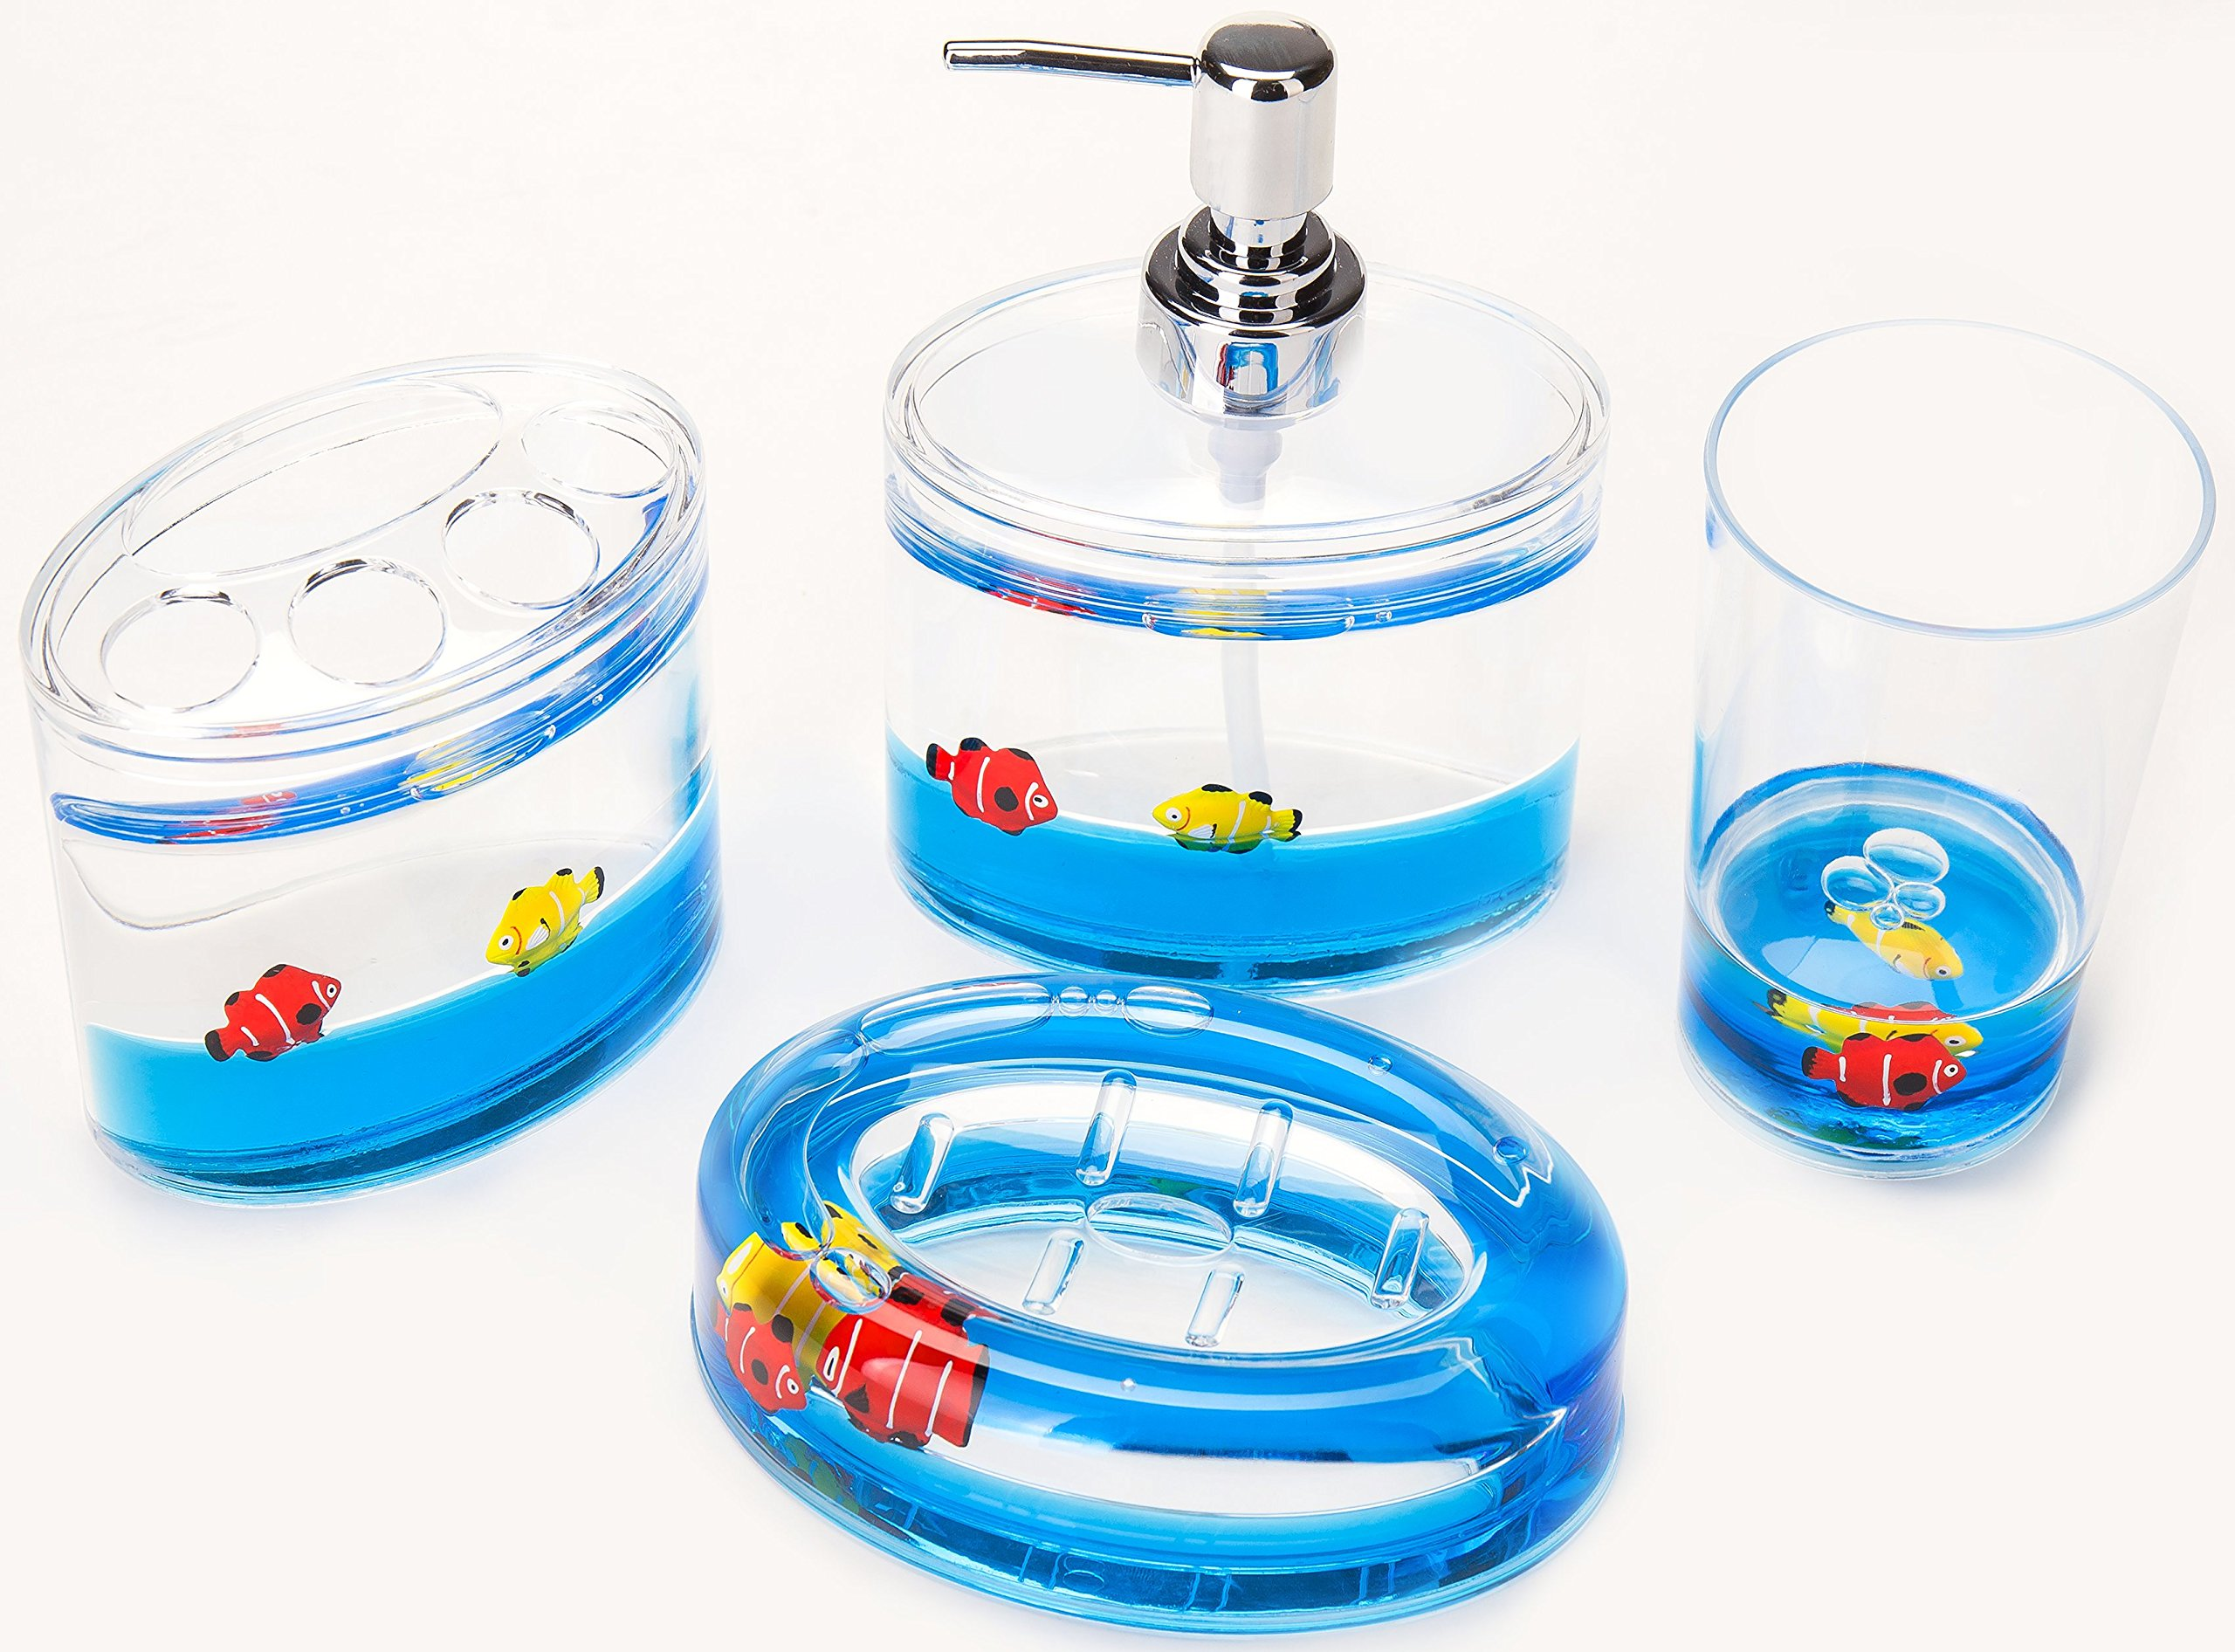 Yeti Decor 4 Piece Acrylic Liquid 3D Floating Motion Bathroom Vanity Accessory Set Fish